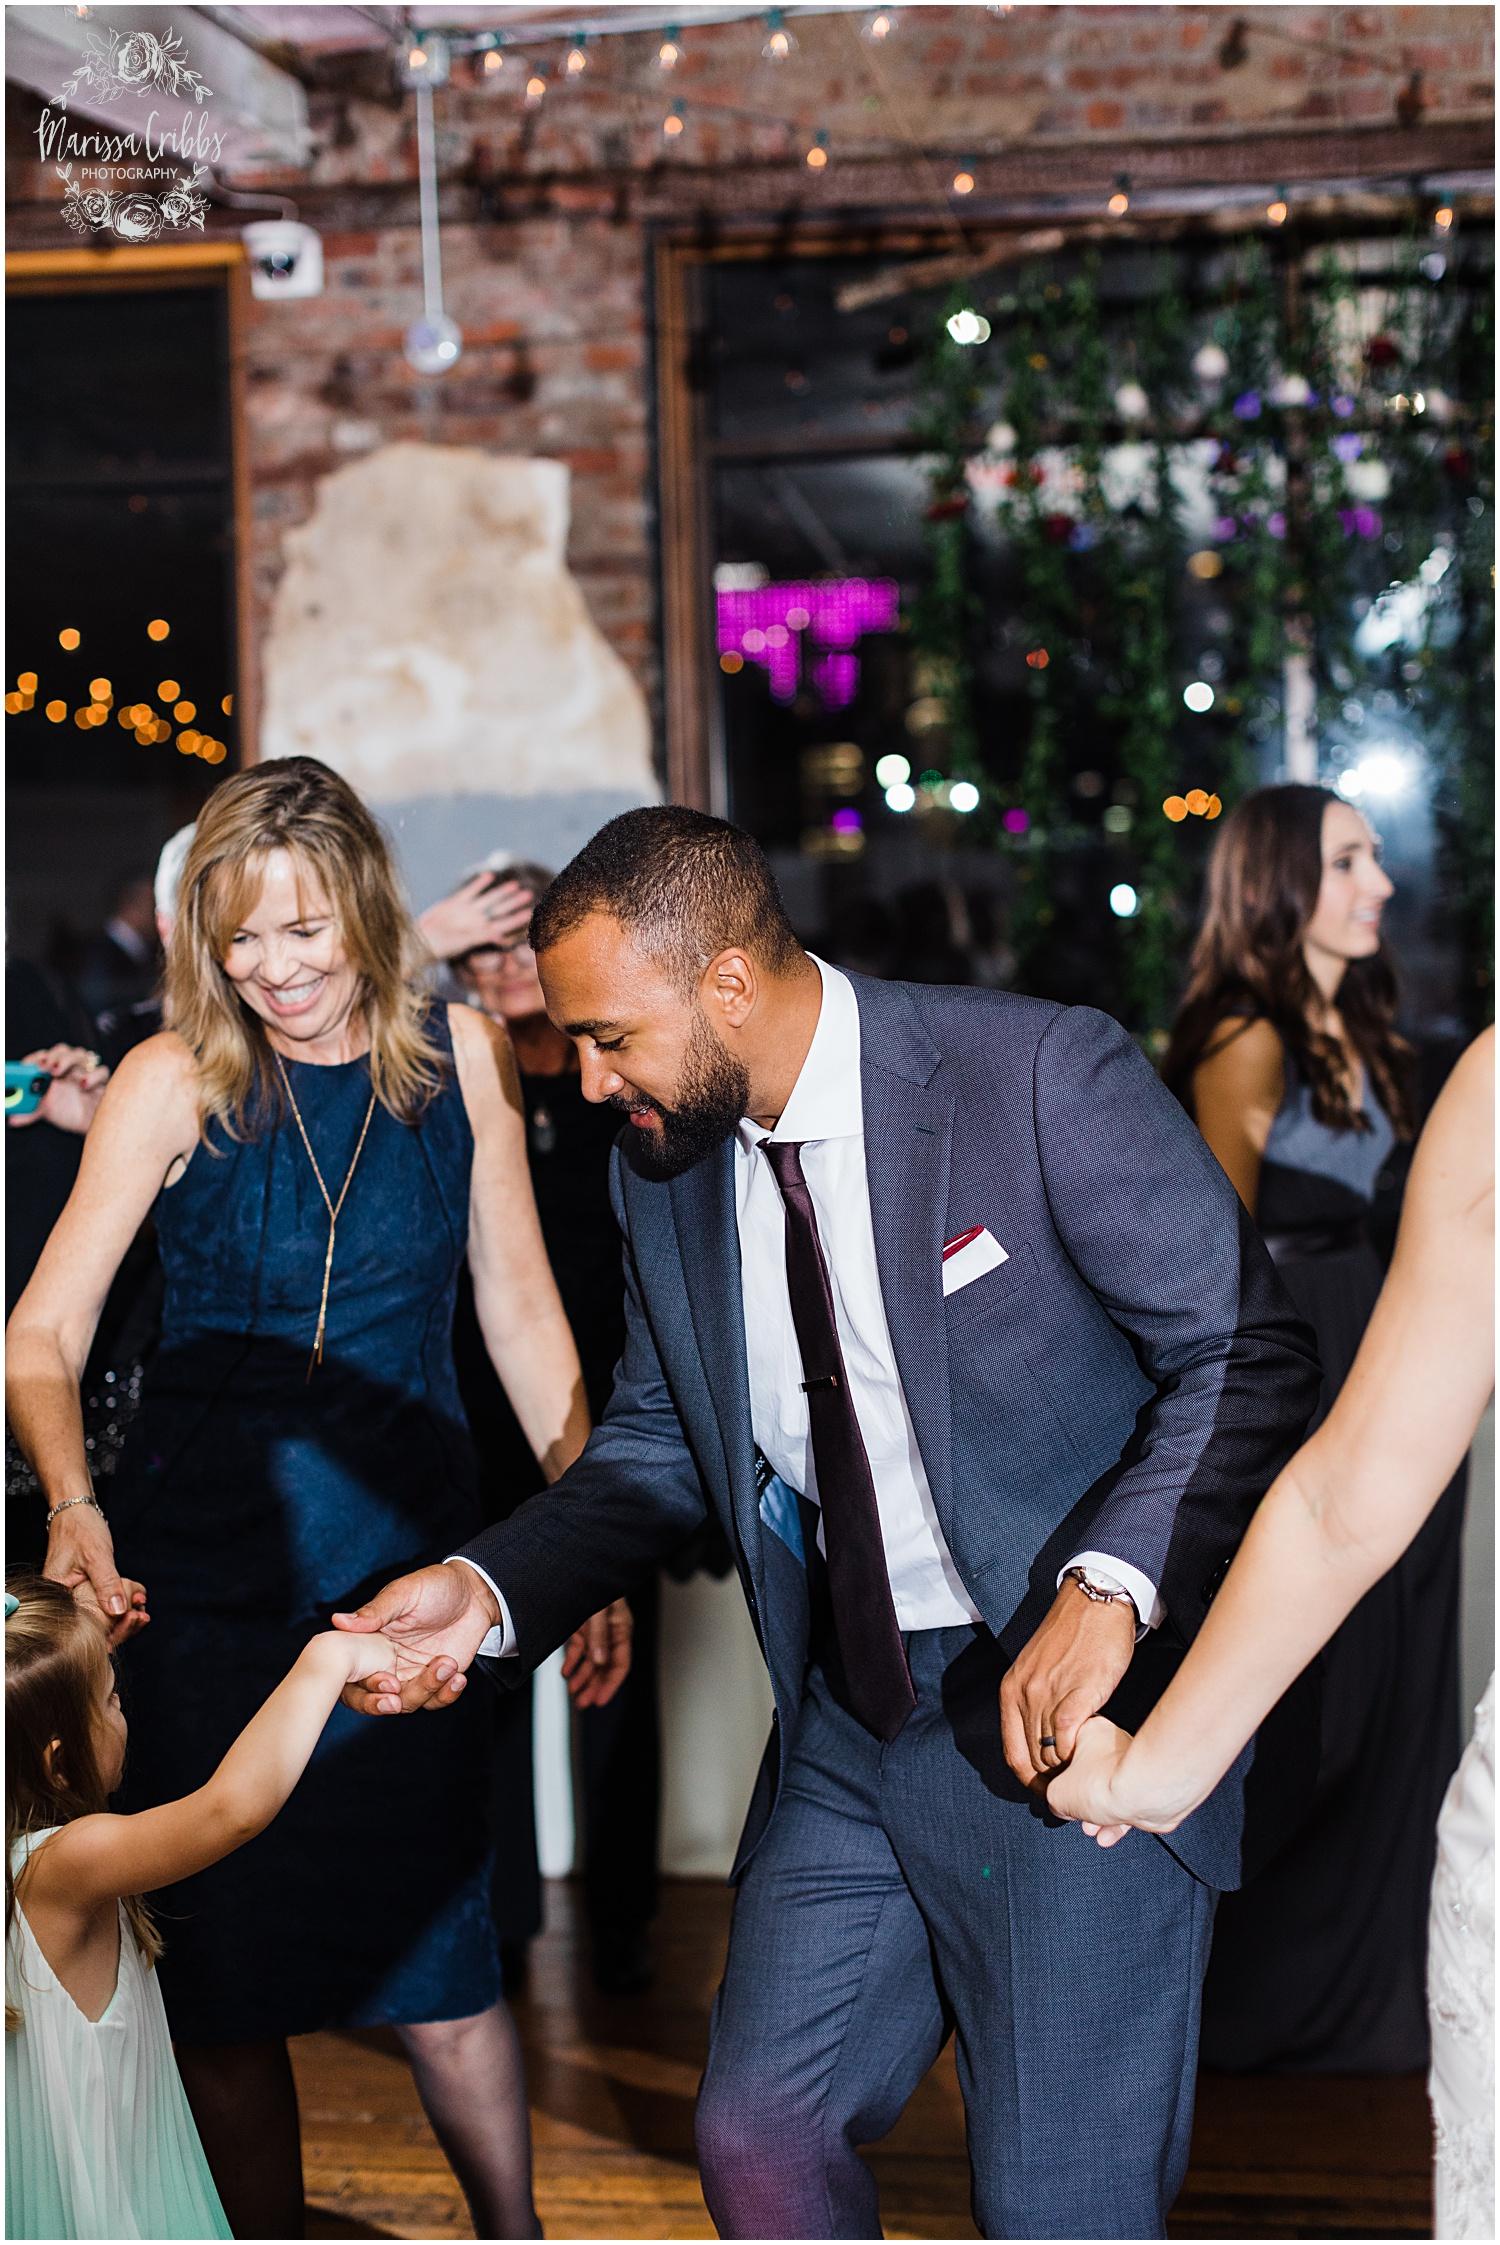 BAUER WEDDING   KELSEA & JUSTIN   MARISSA CRIBBS PHOTOGRAPHY_6614.jpg